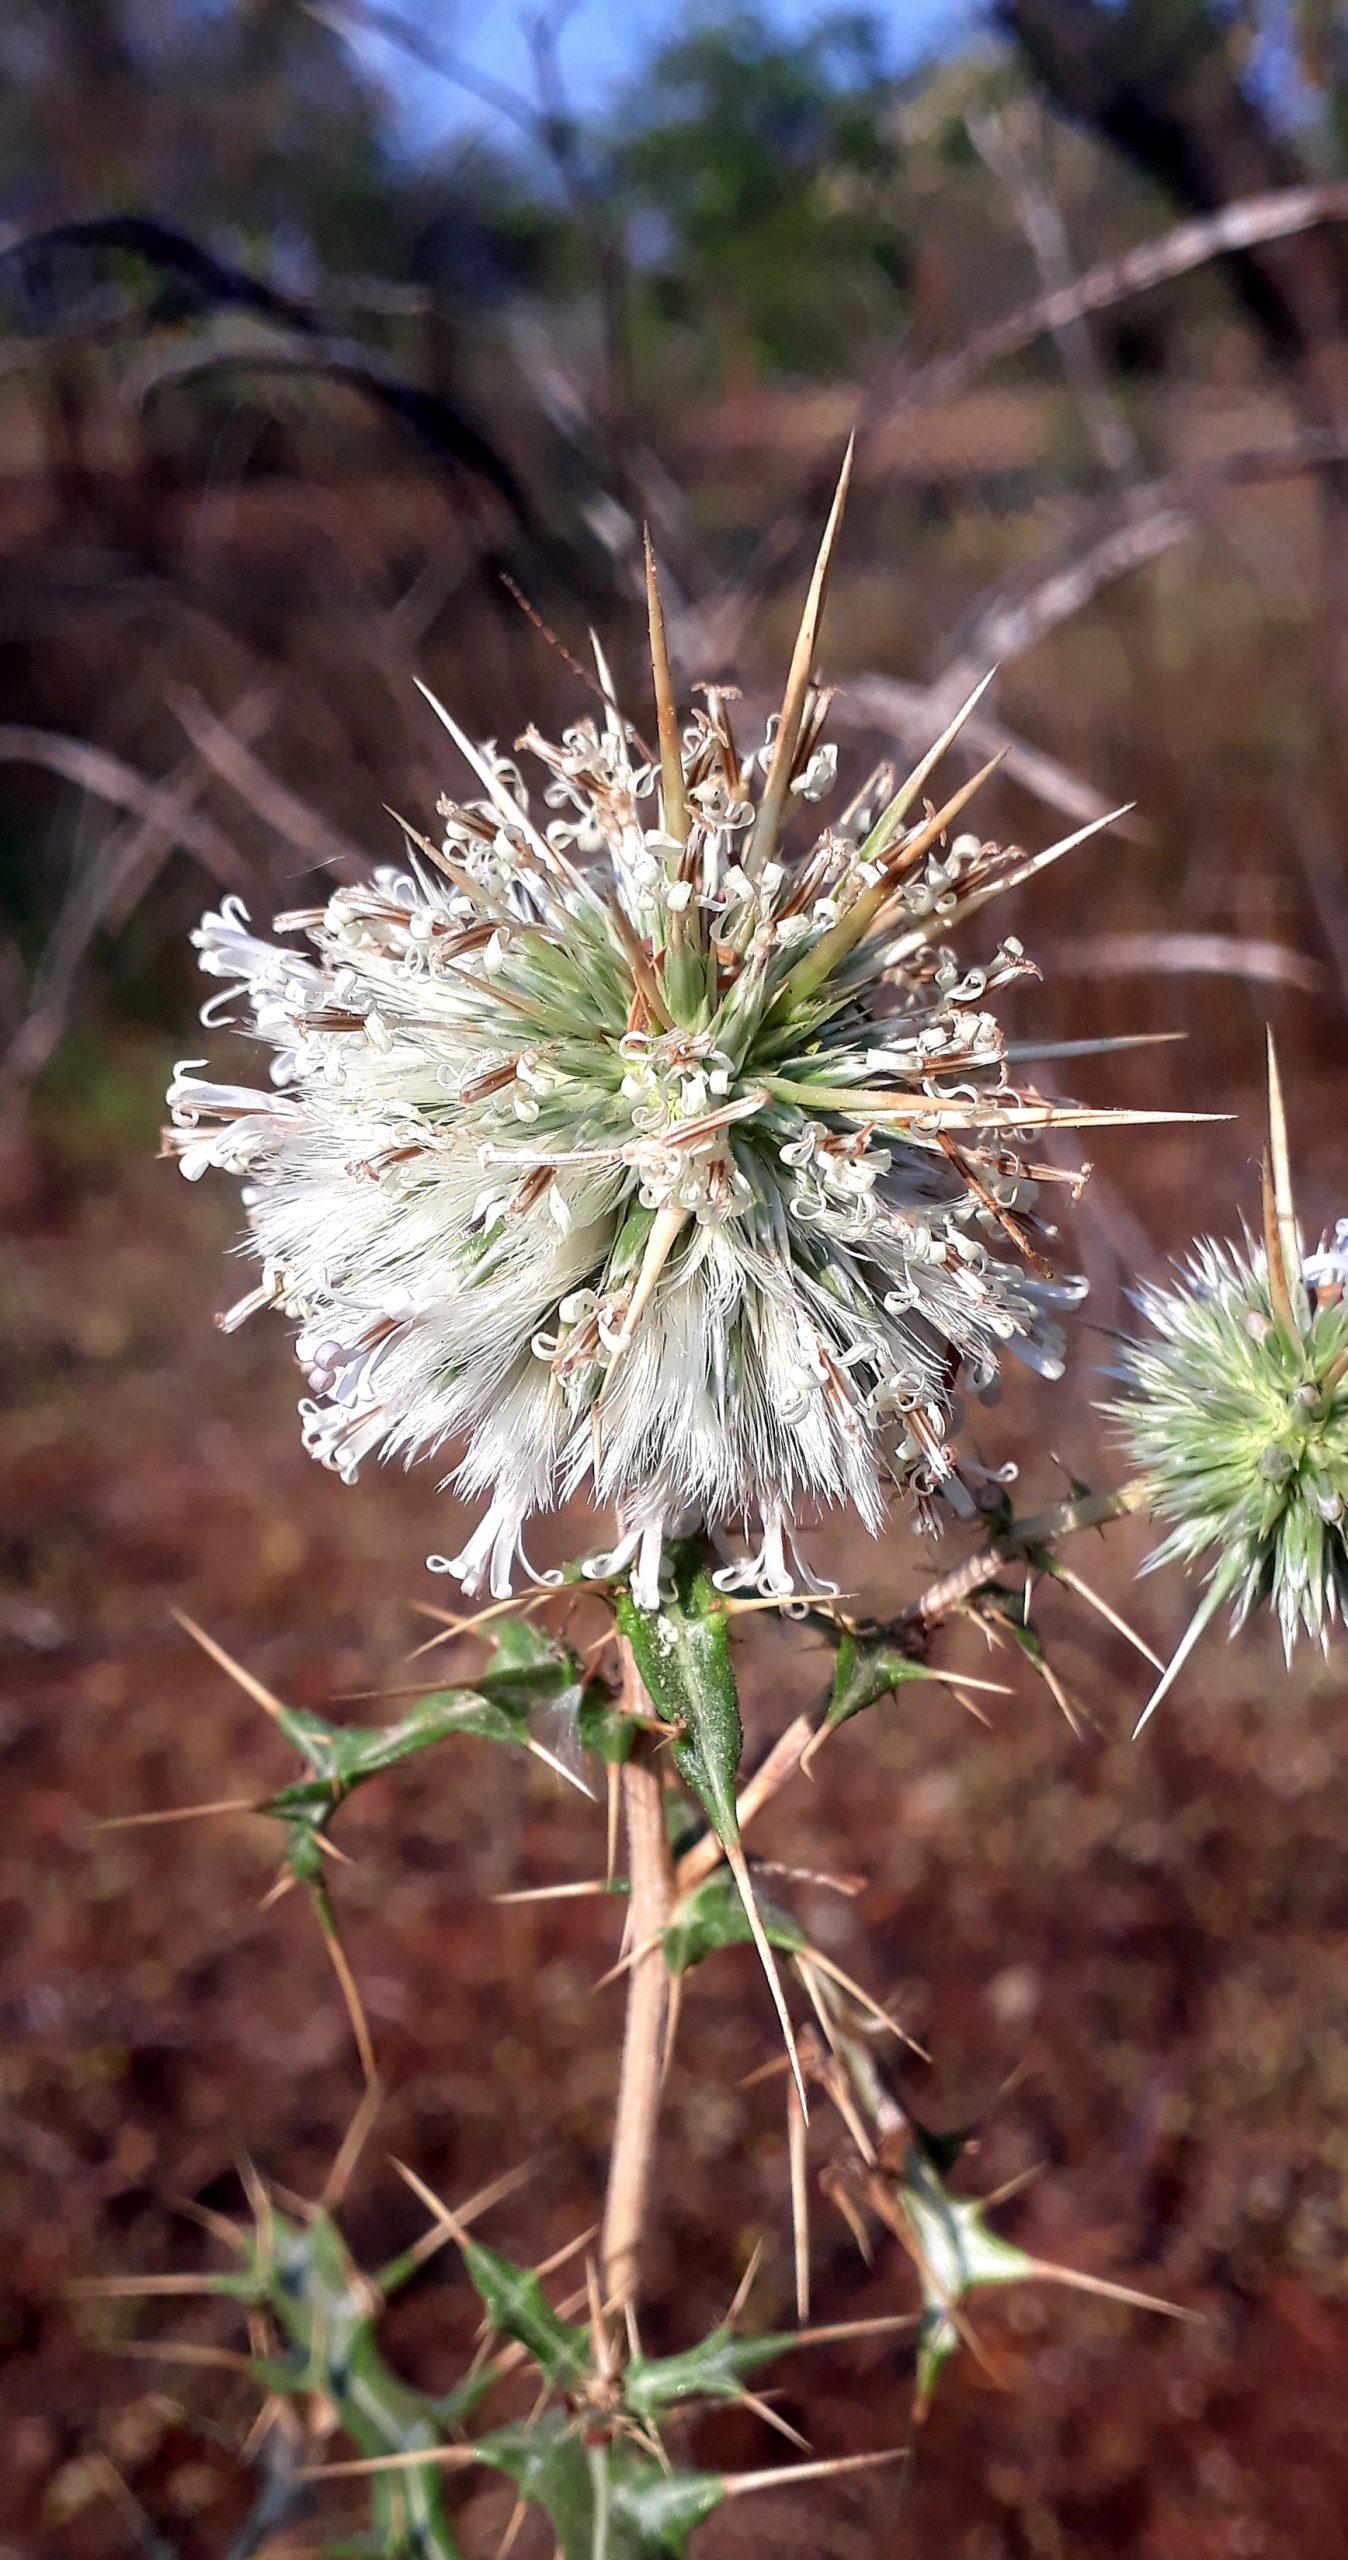 Wild thorny flower plant